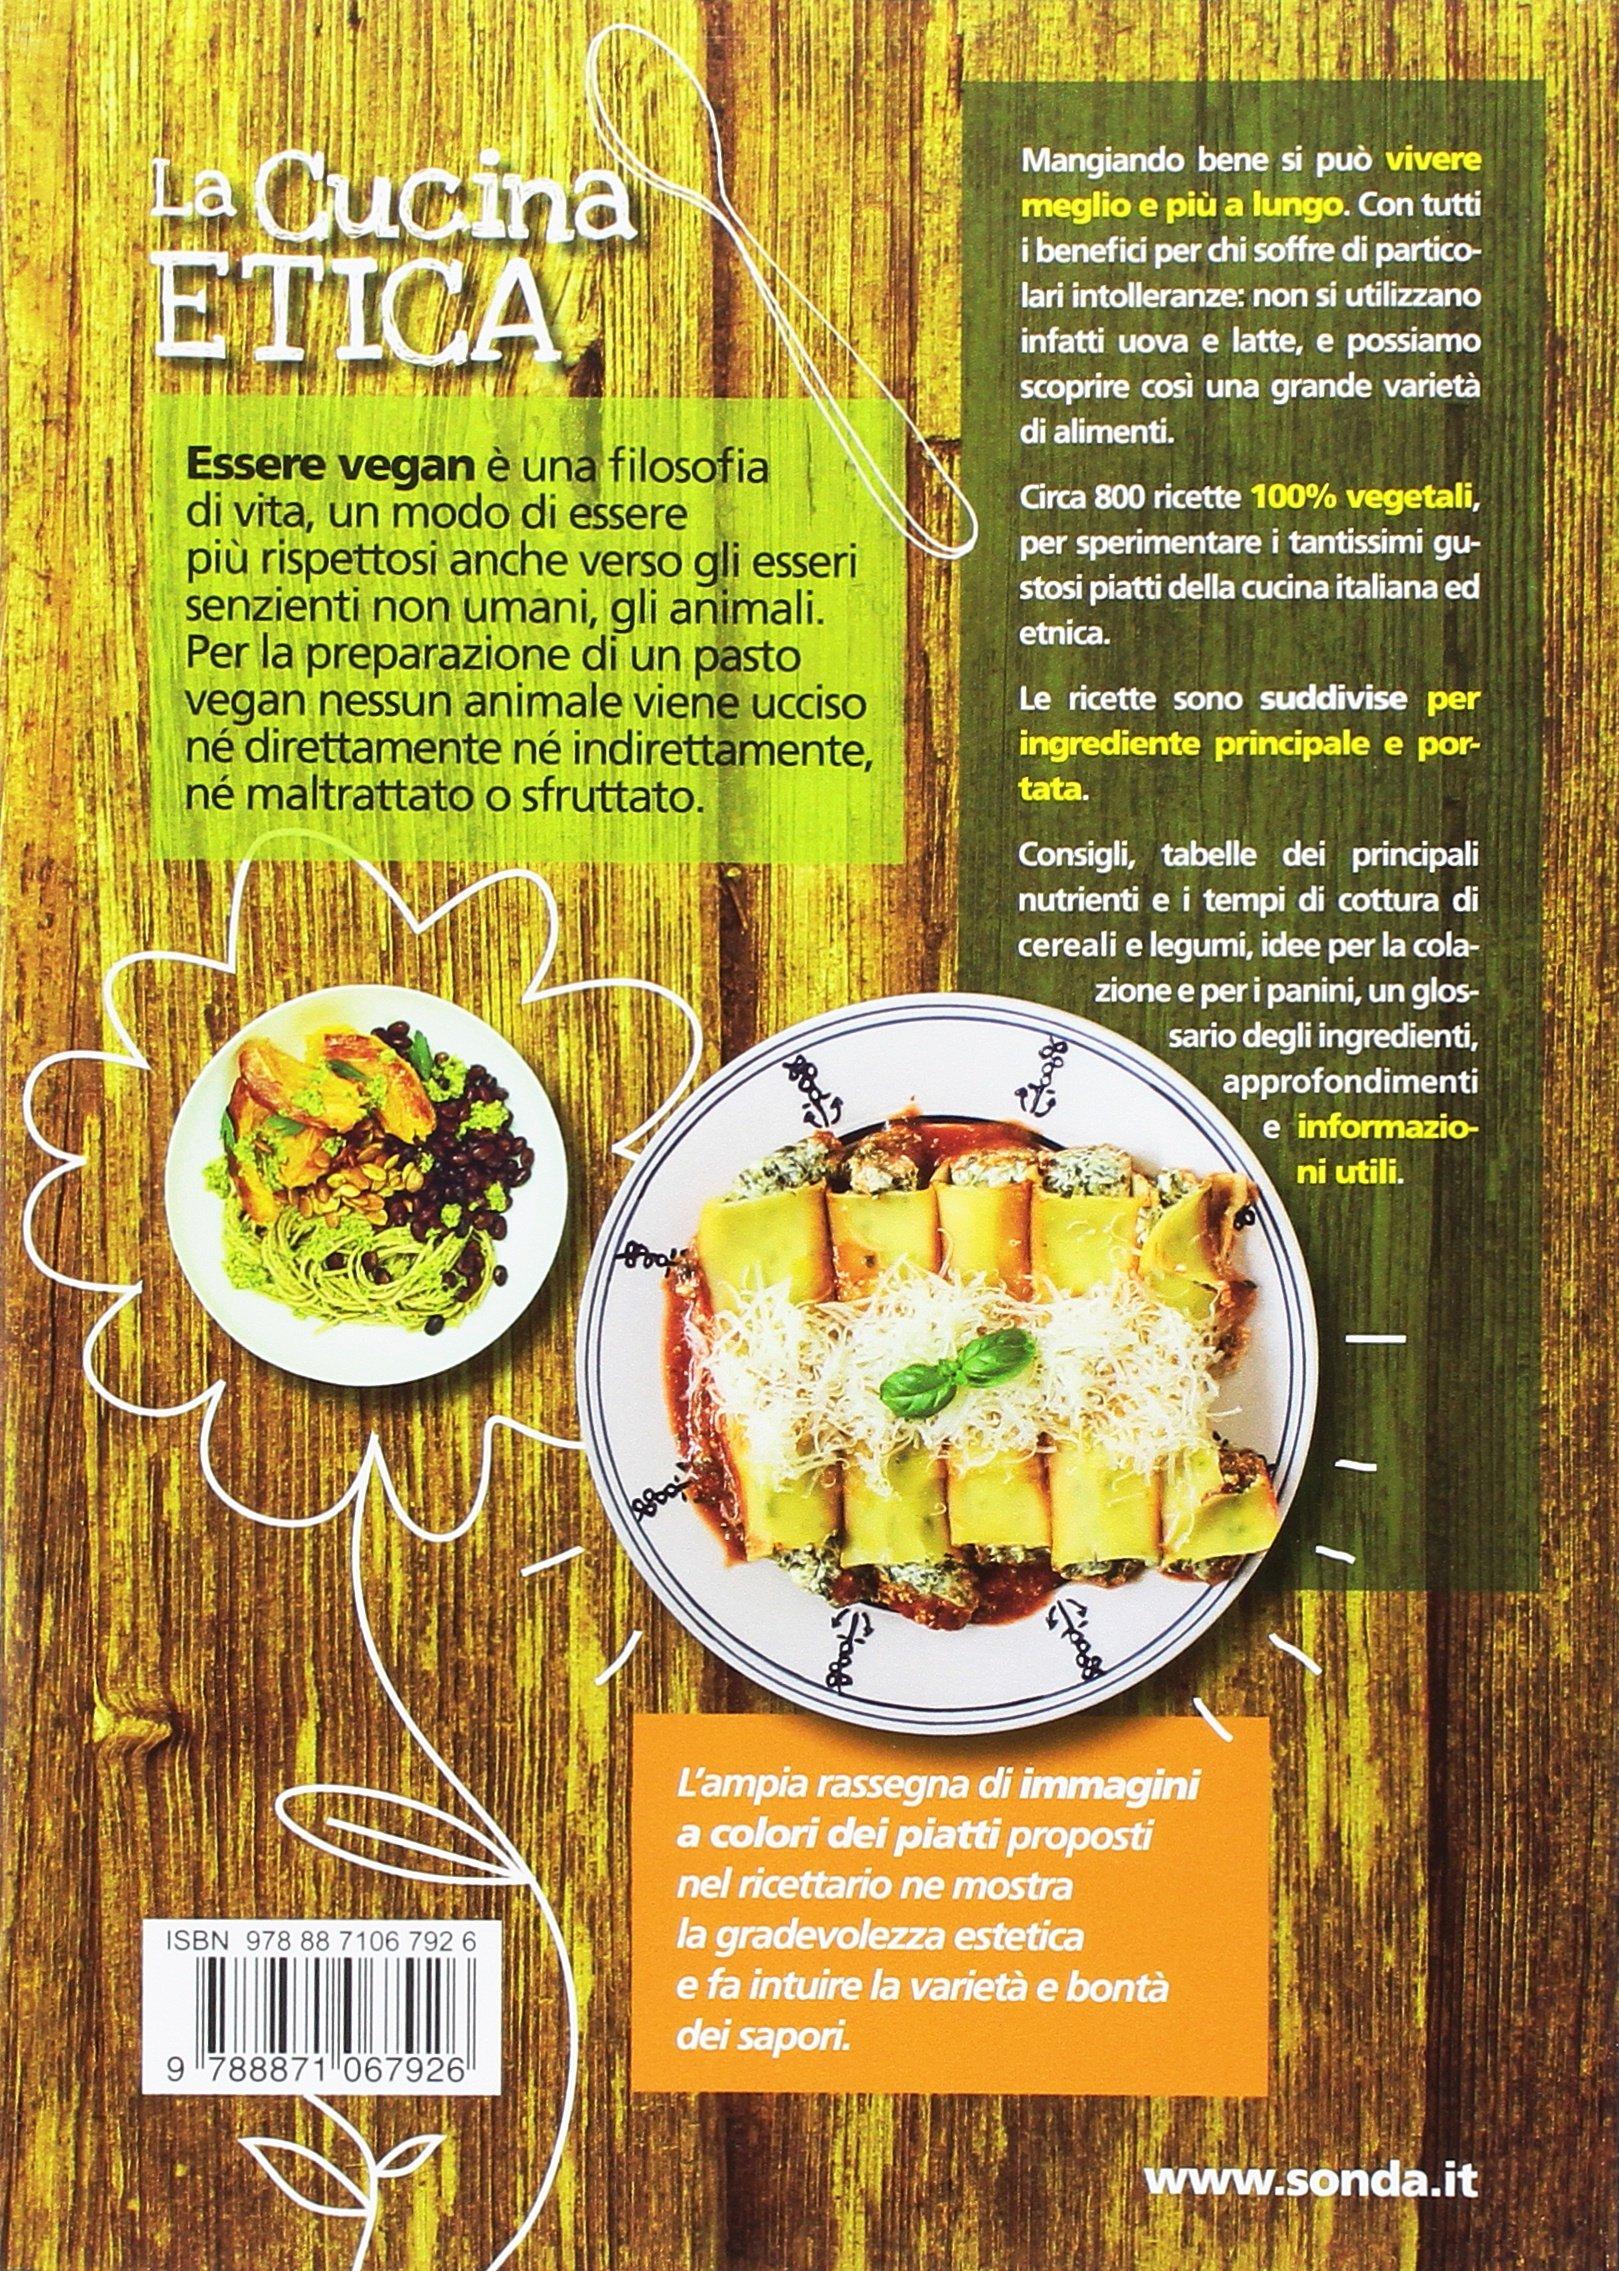 Piu completo ricettario di cucina vegana